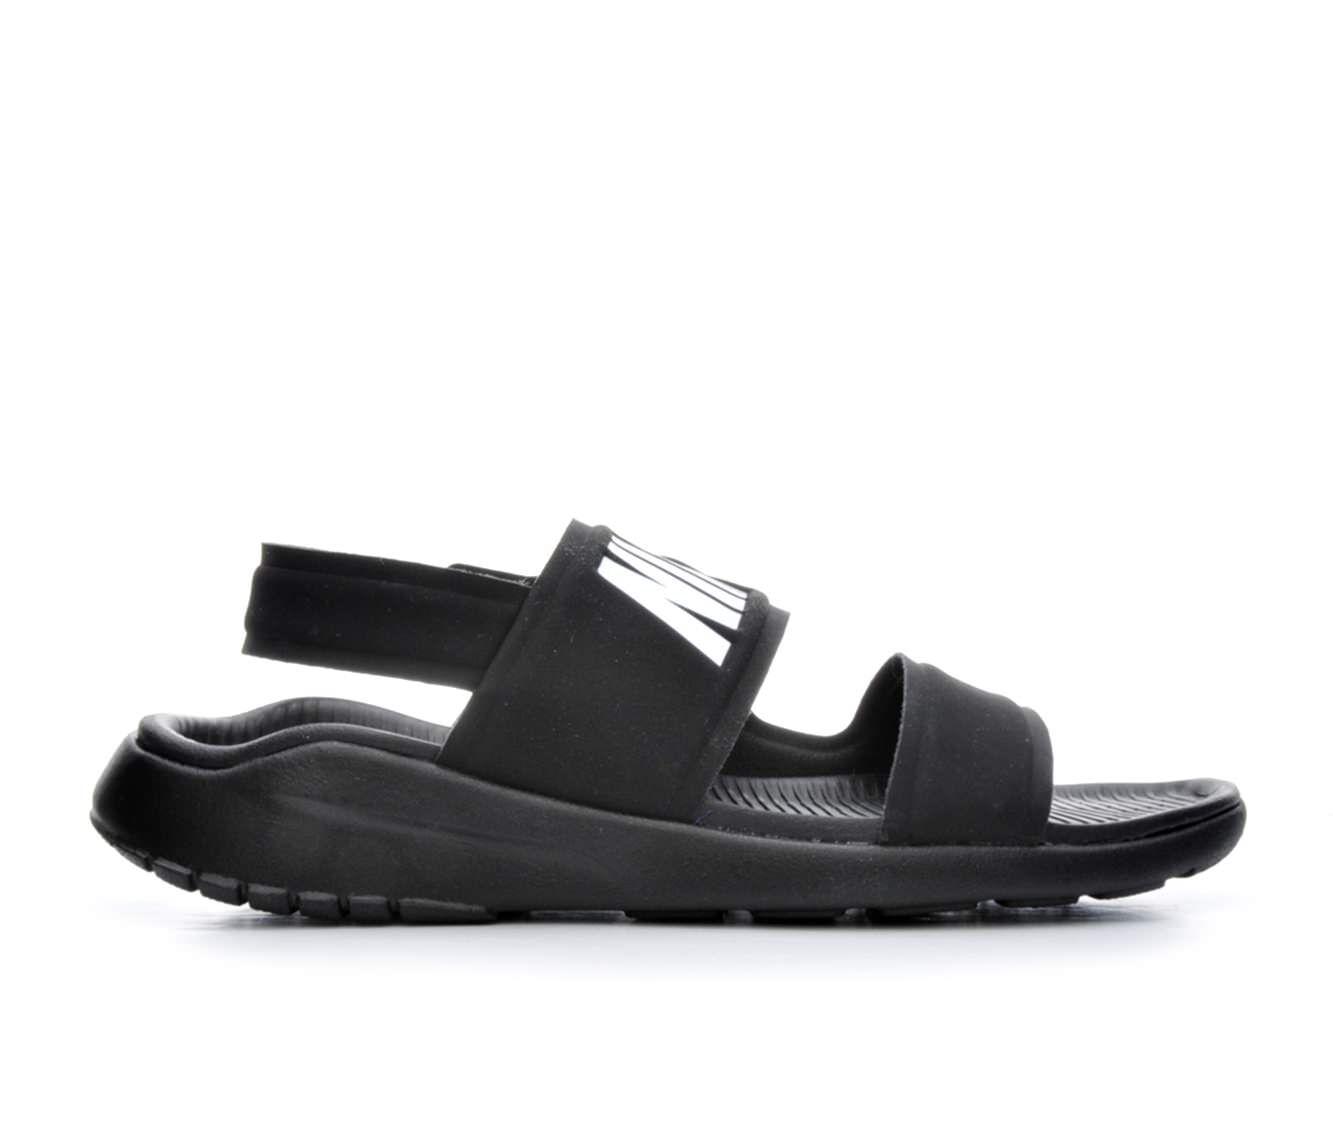 422adbb44053 ... canada womens nike tanjun sandal sport sandals shoe carnival 0cbc5 1fe73